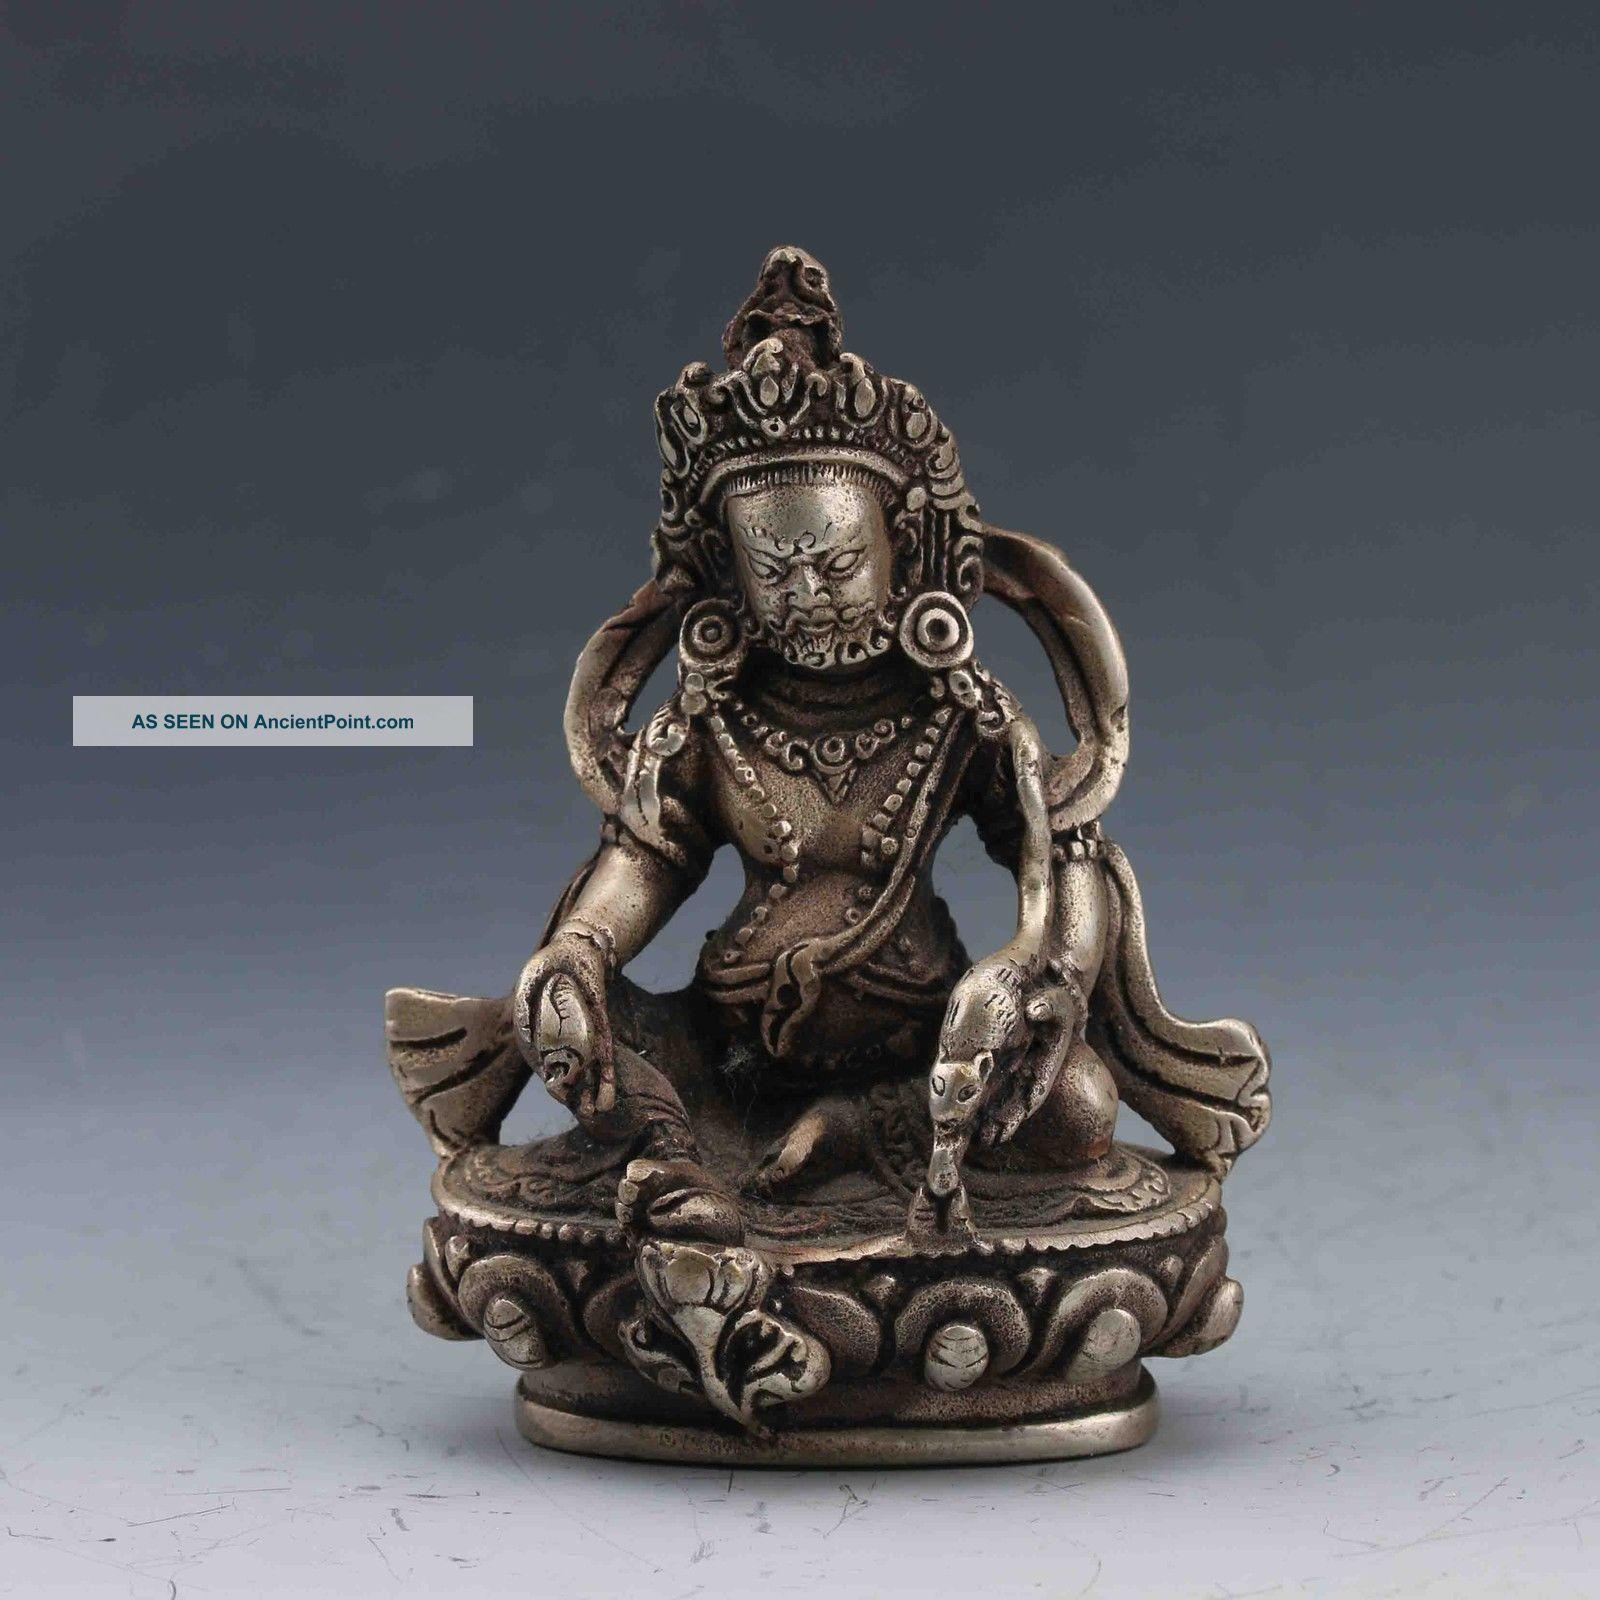 Collectible Chinese Silver Copper Handwork Tibetan Buddhism Statue Buddha photo